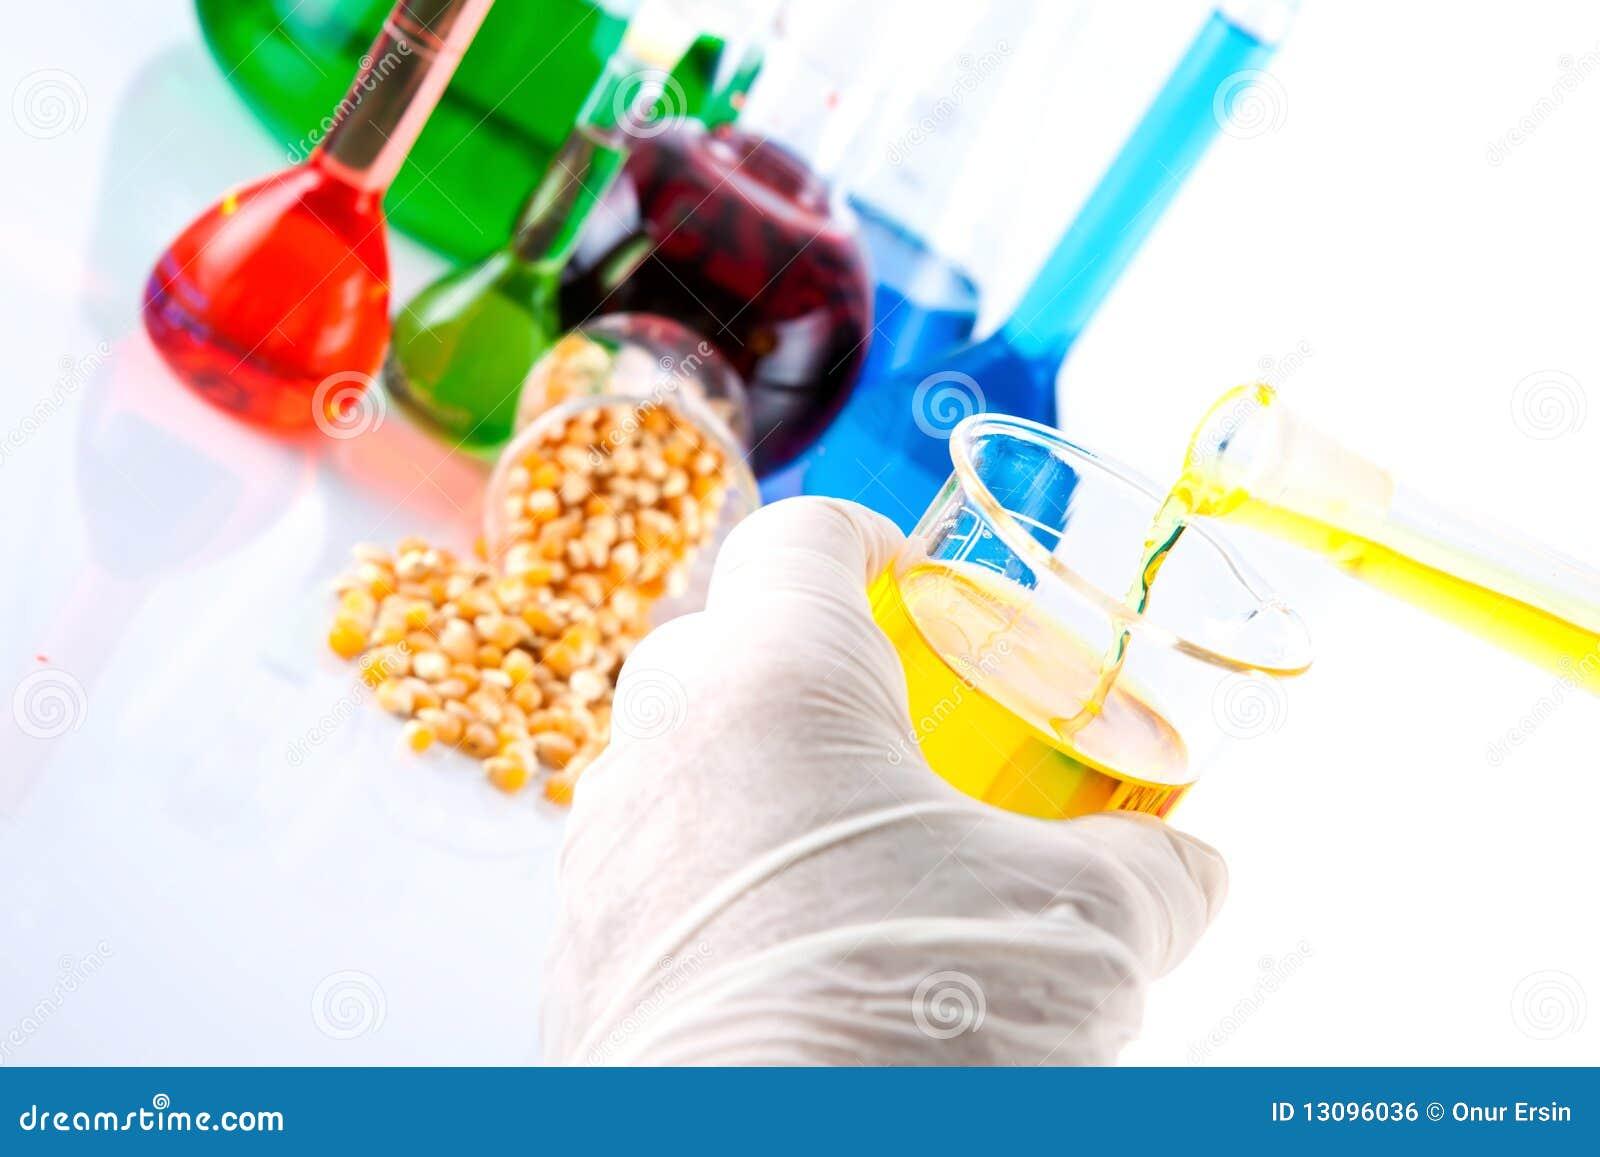 Biodiesel Research